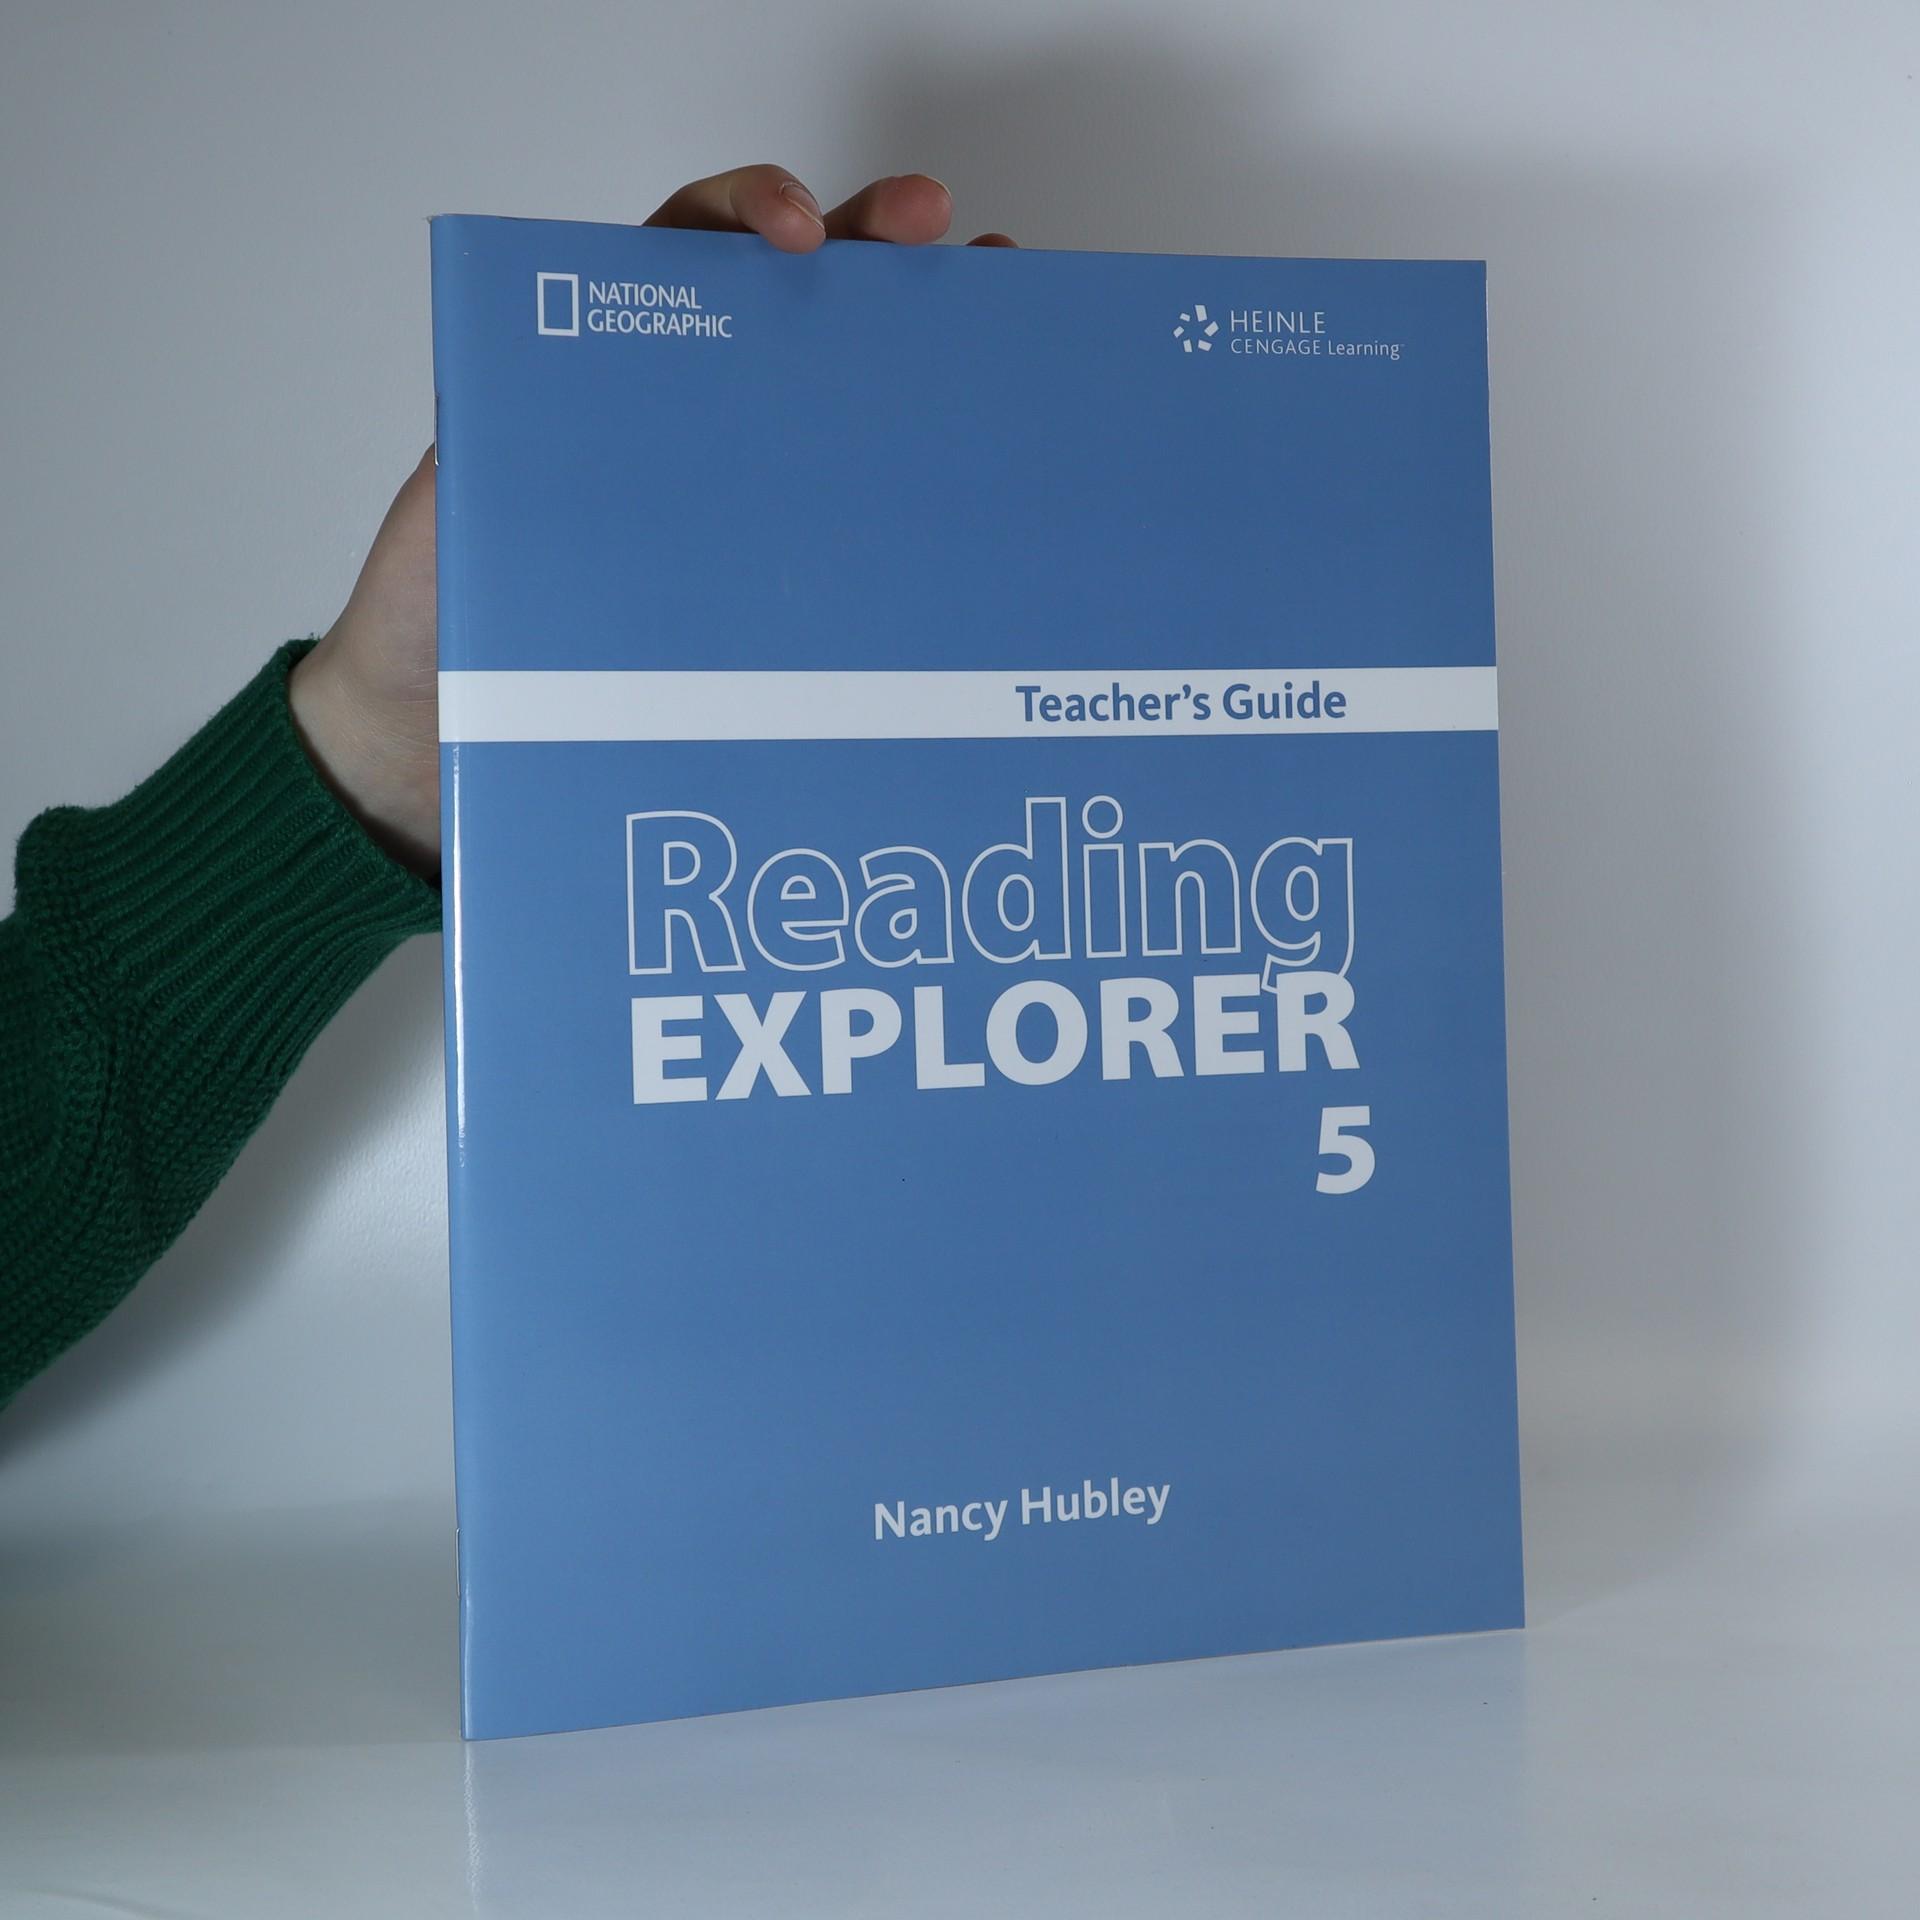 antikvární kniha Reading explorer 5 : teacher's guide, neuveden